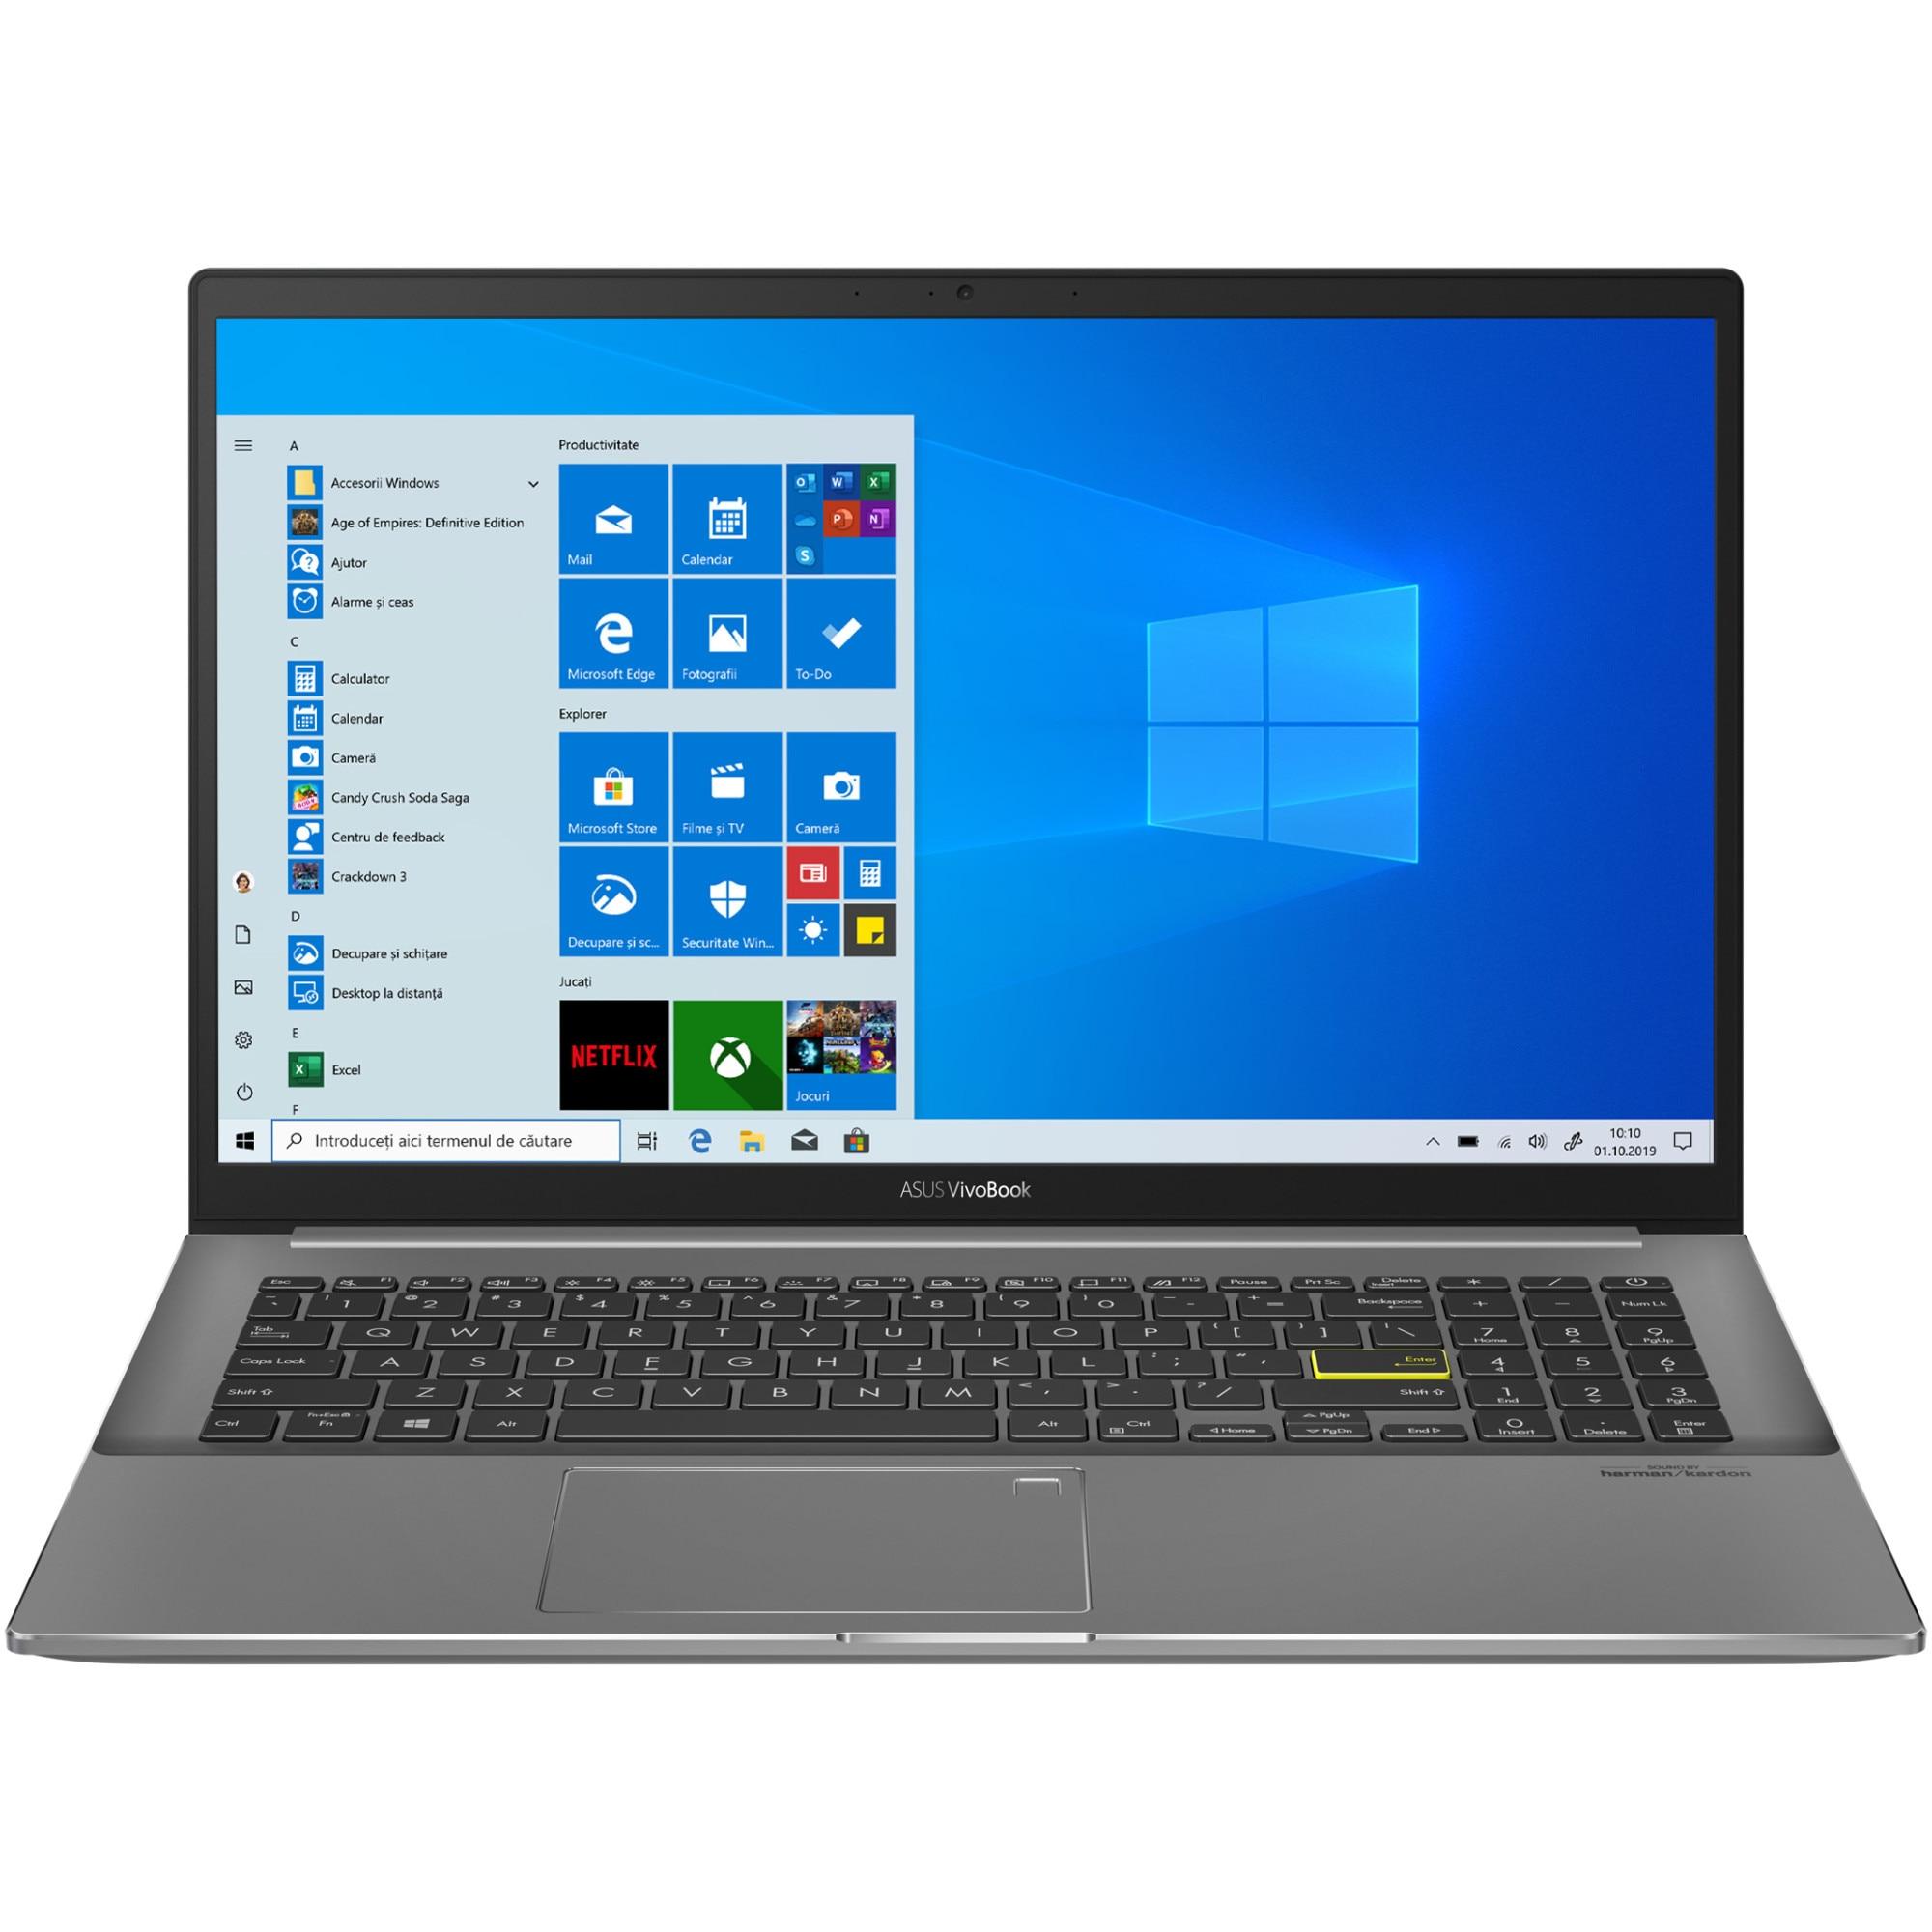 "Fotografie Laptop ASUS VivoBook S15 M533IA cu procesor AMD Ryzen(tm) 7 4700U pana la 4.10 GHz, 15.6"", Full HD, 16GB, 512GB SSD, AMD Radeon(tm) Graphics, Windows 10 Pro, Indie Black"